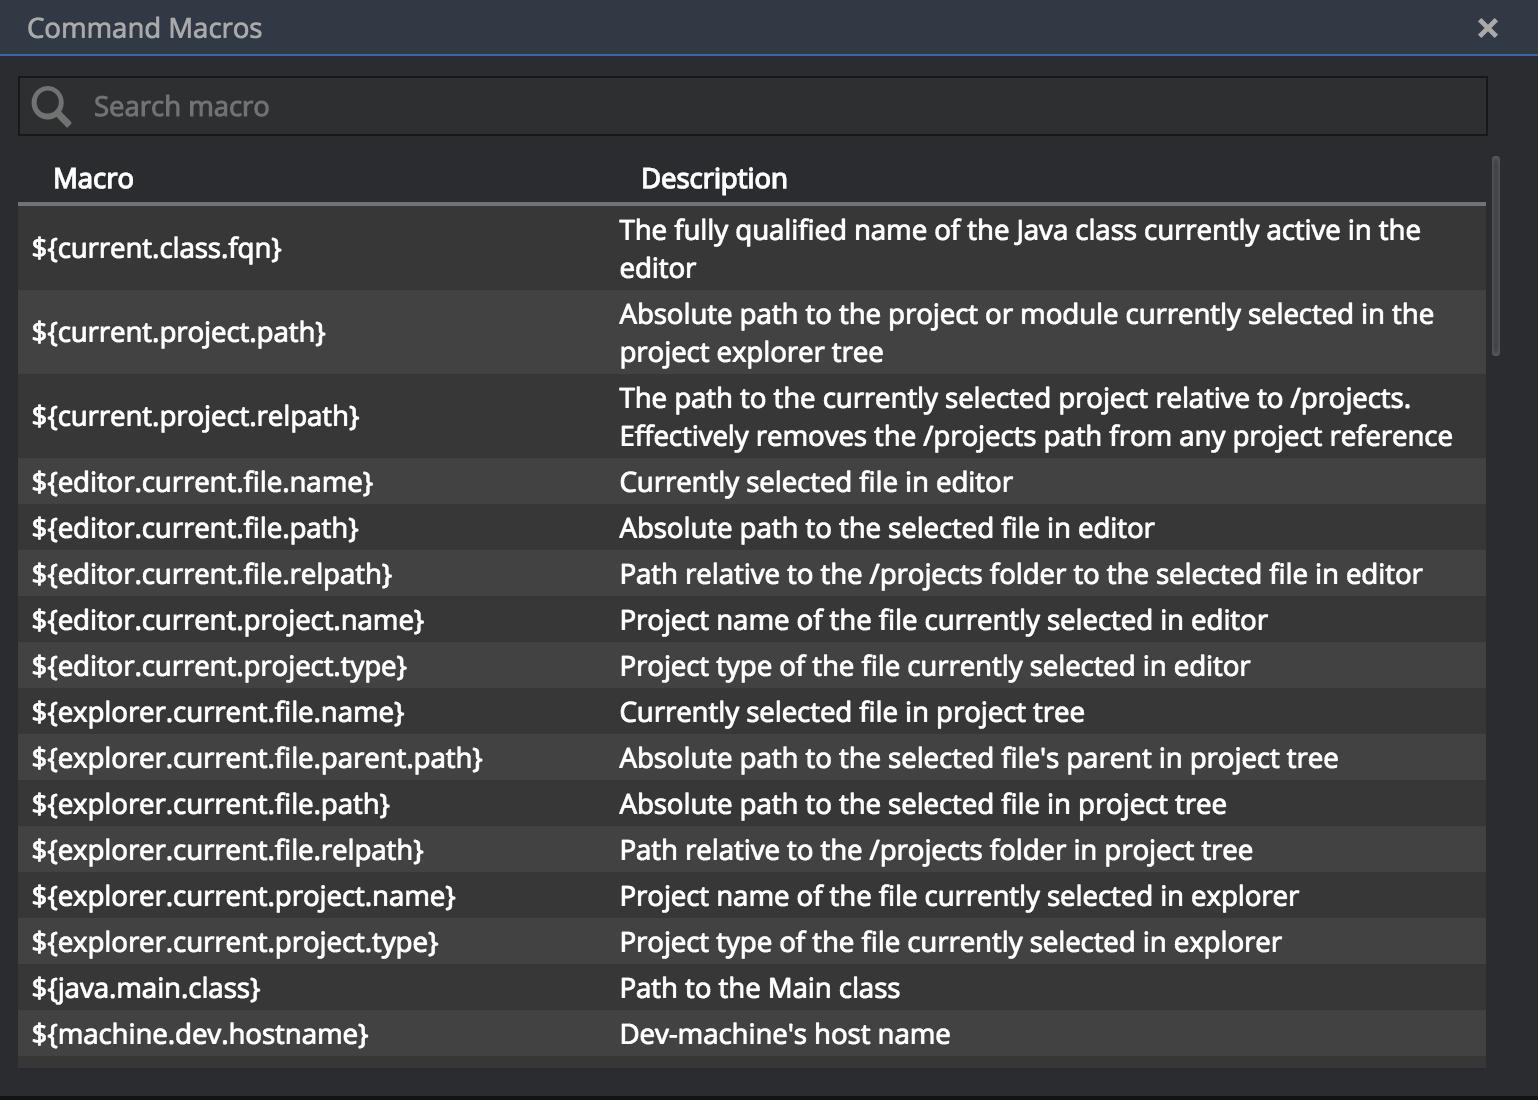 command macros list